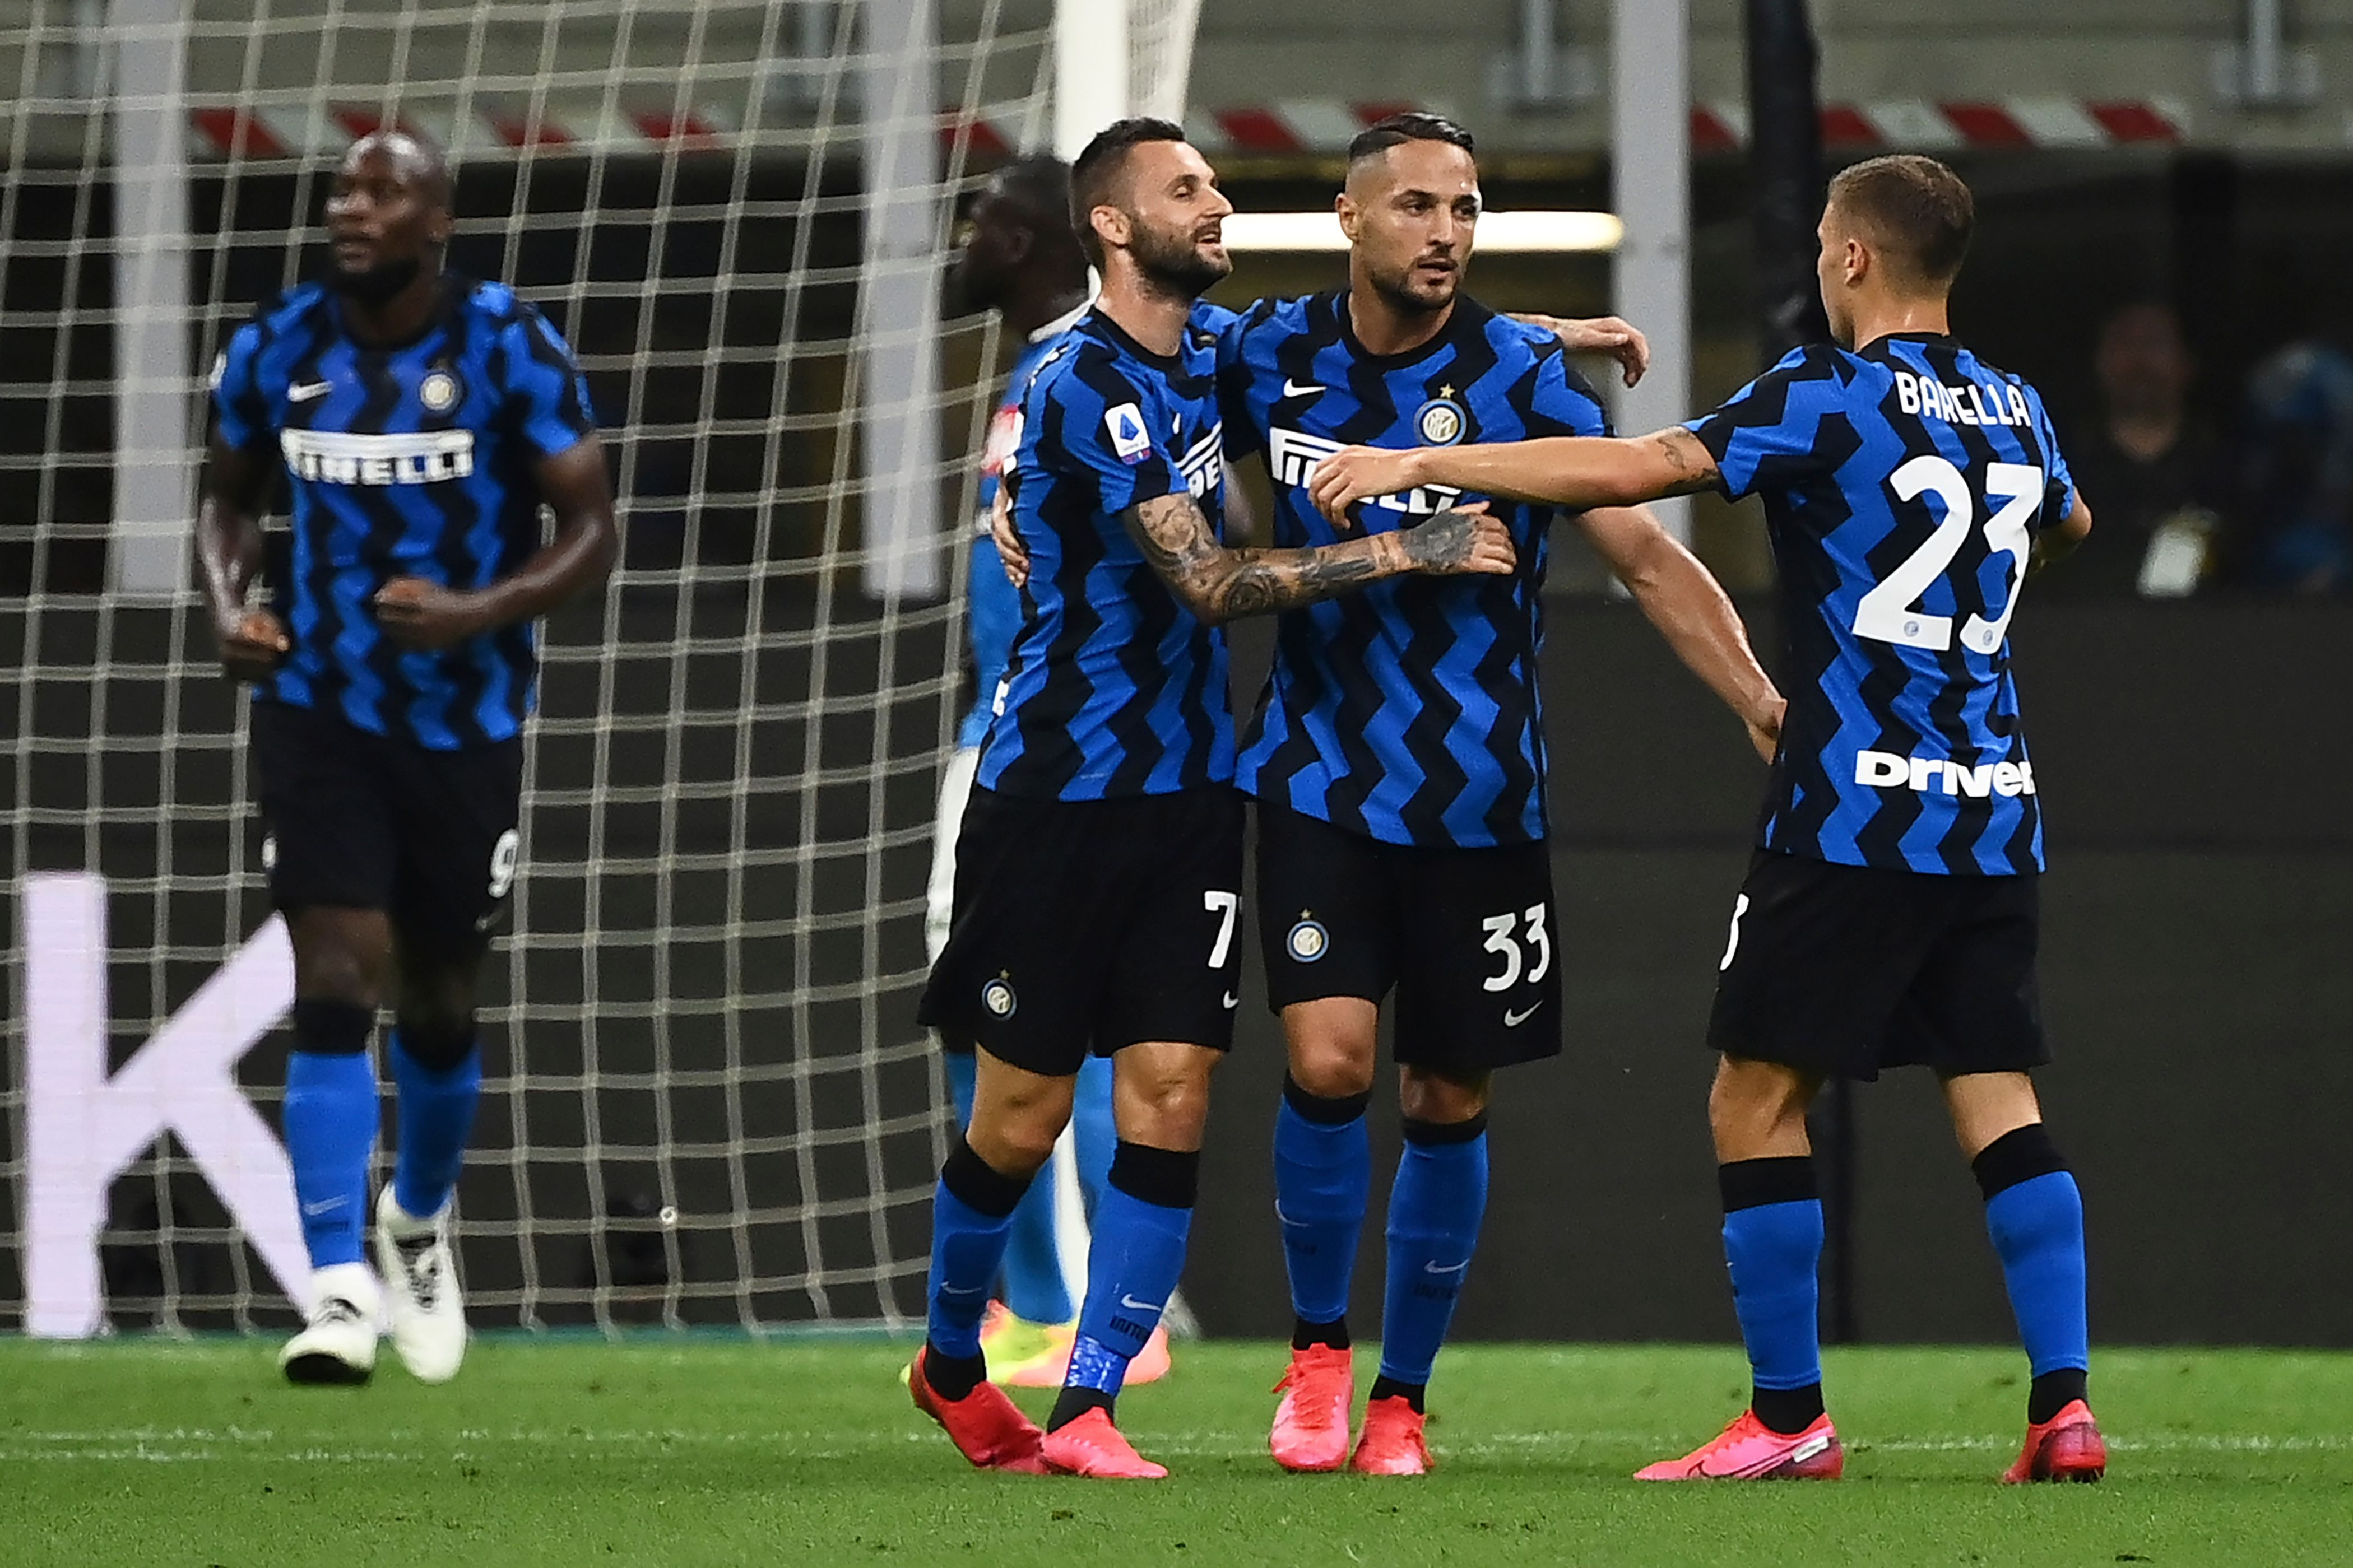 Inter Milan Bantai Napoli 2 - 0 Di Stadion San Siro 29 Juli 2020